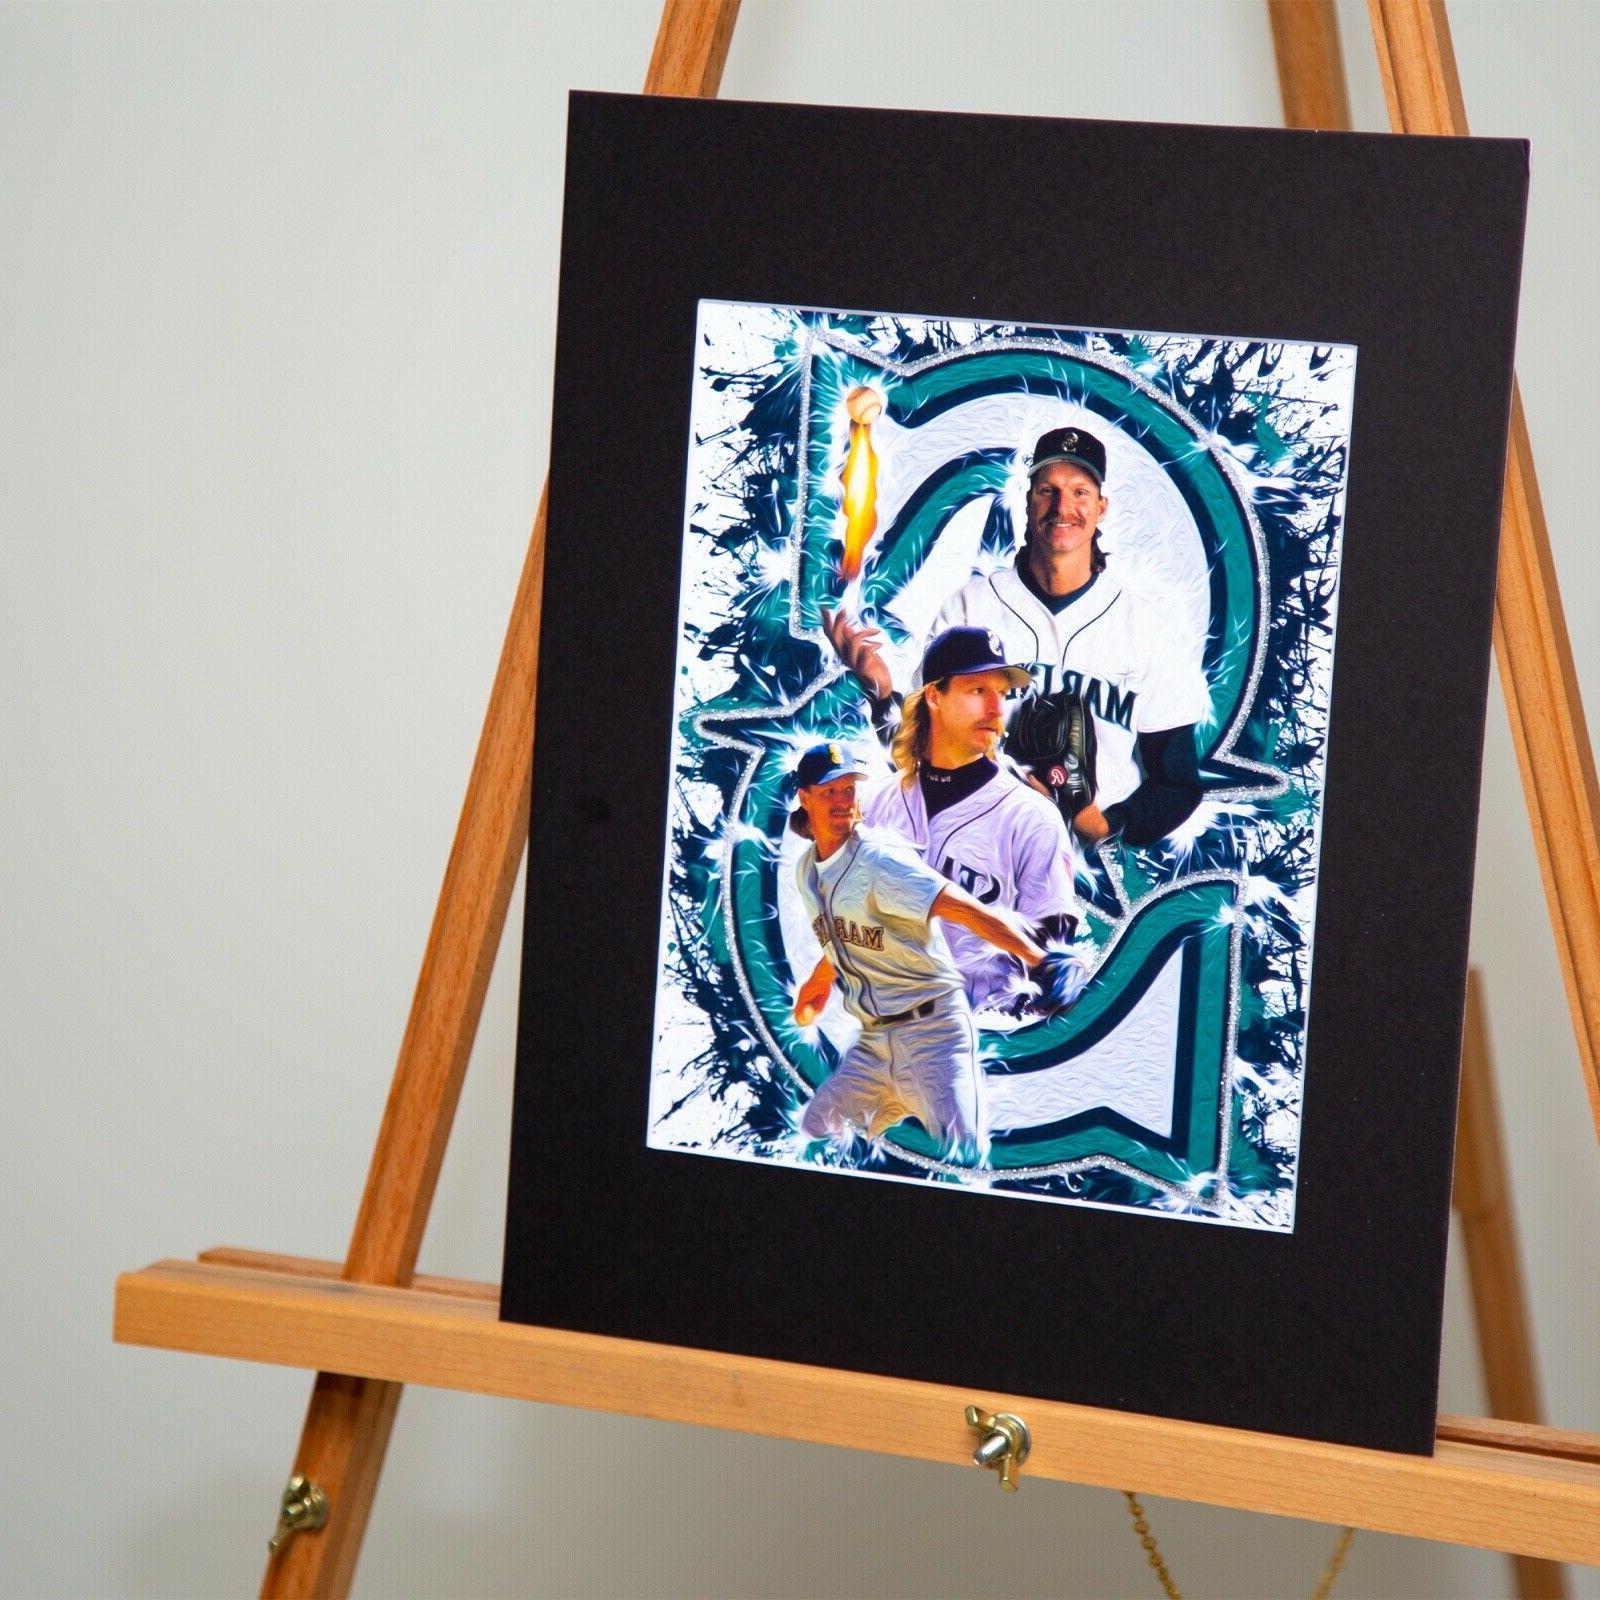 Seattle Mariners Johnson #51 - The Big Original Artwork